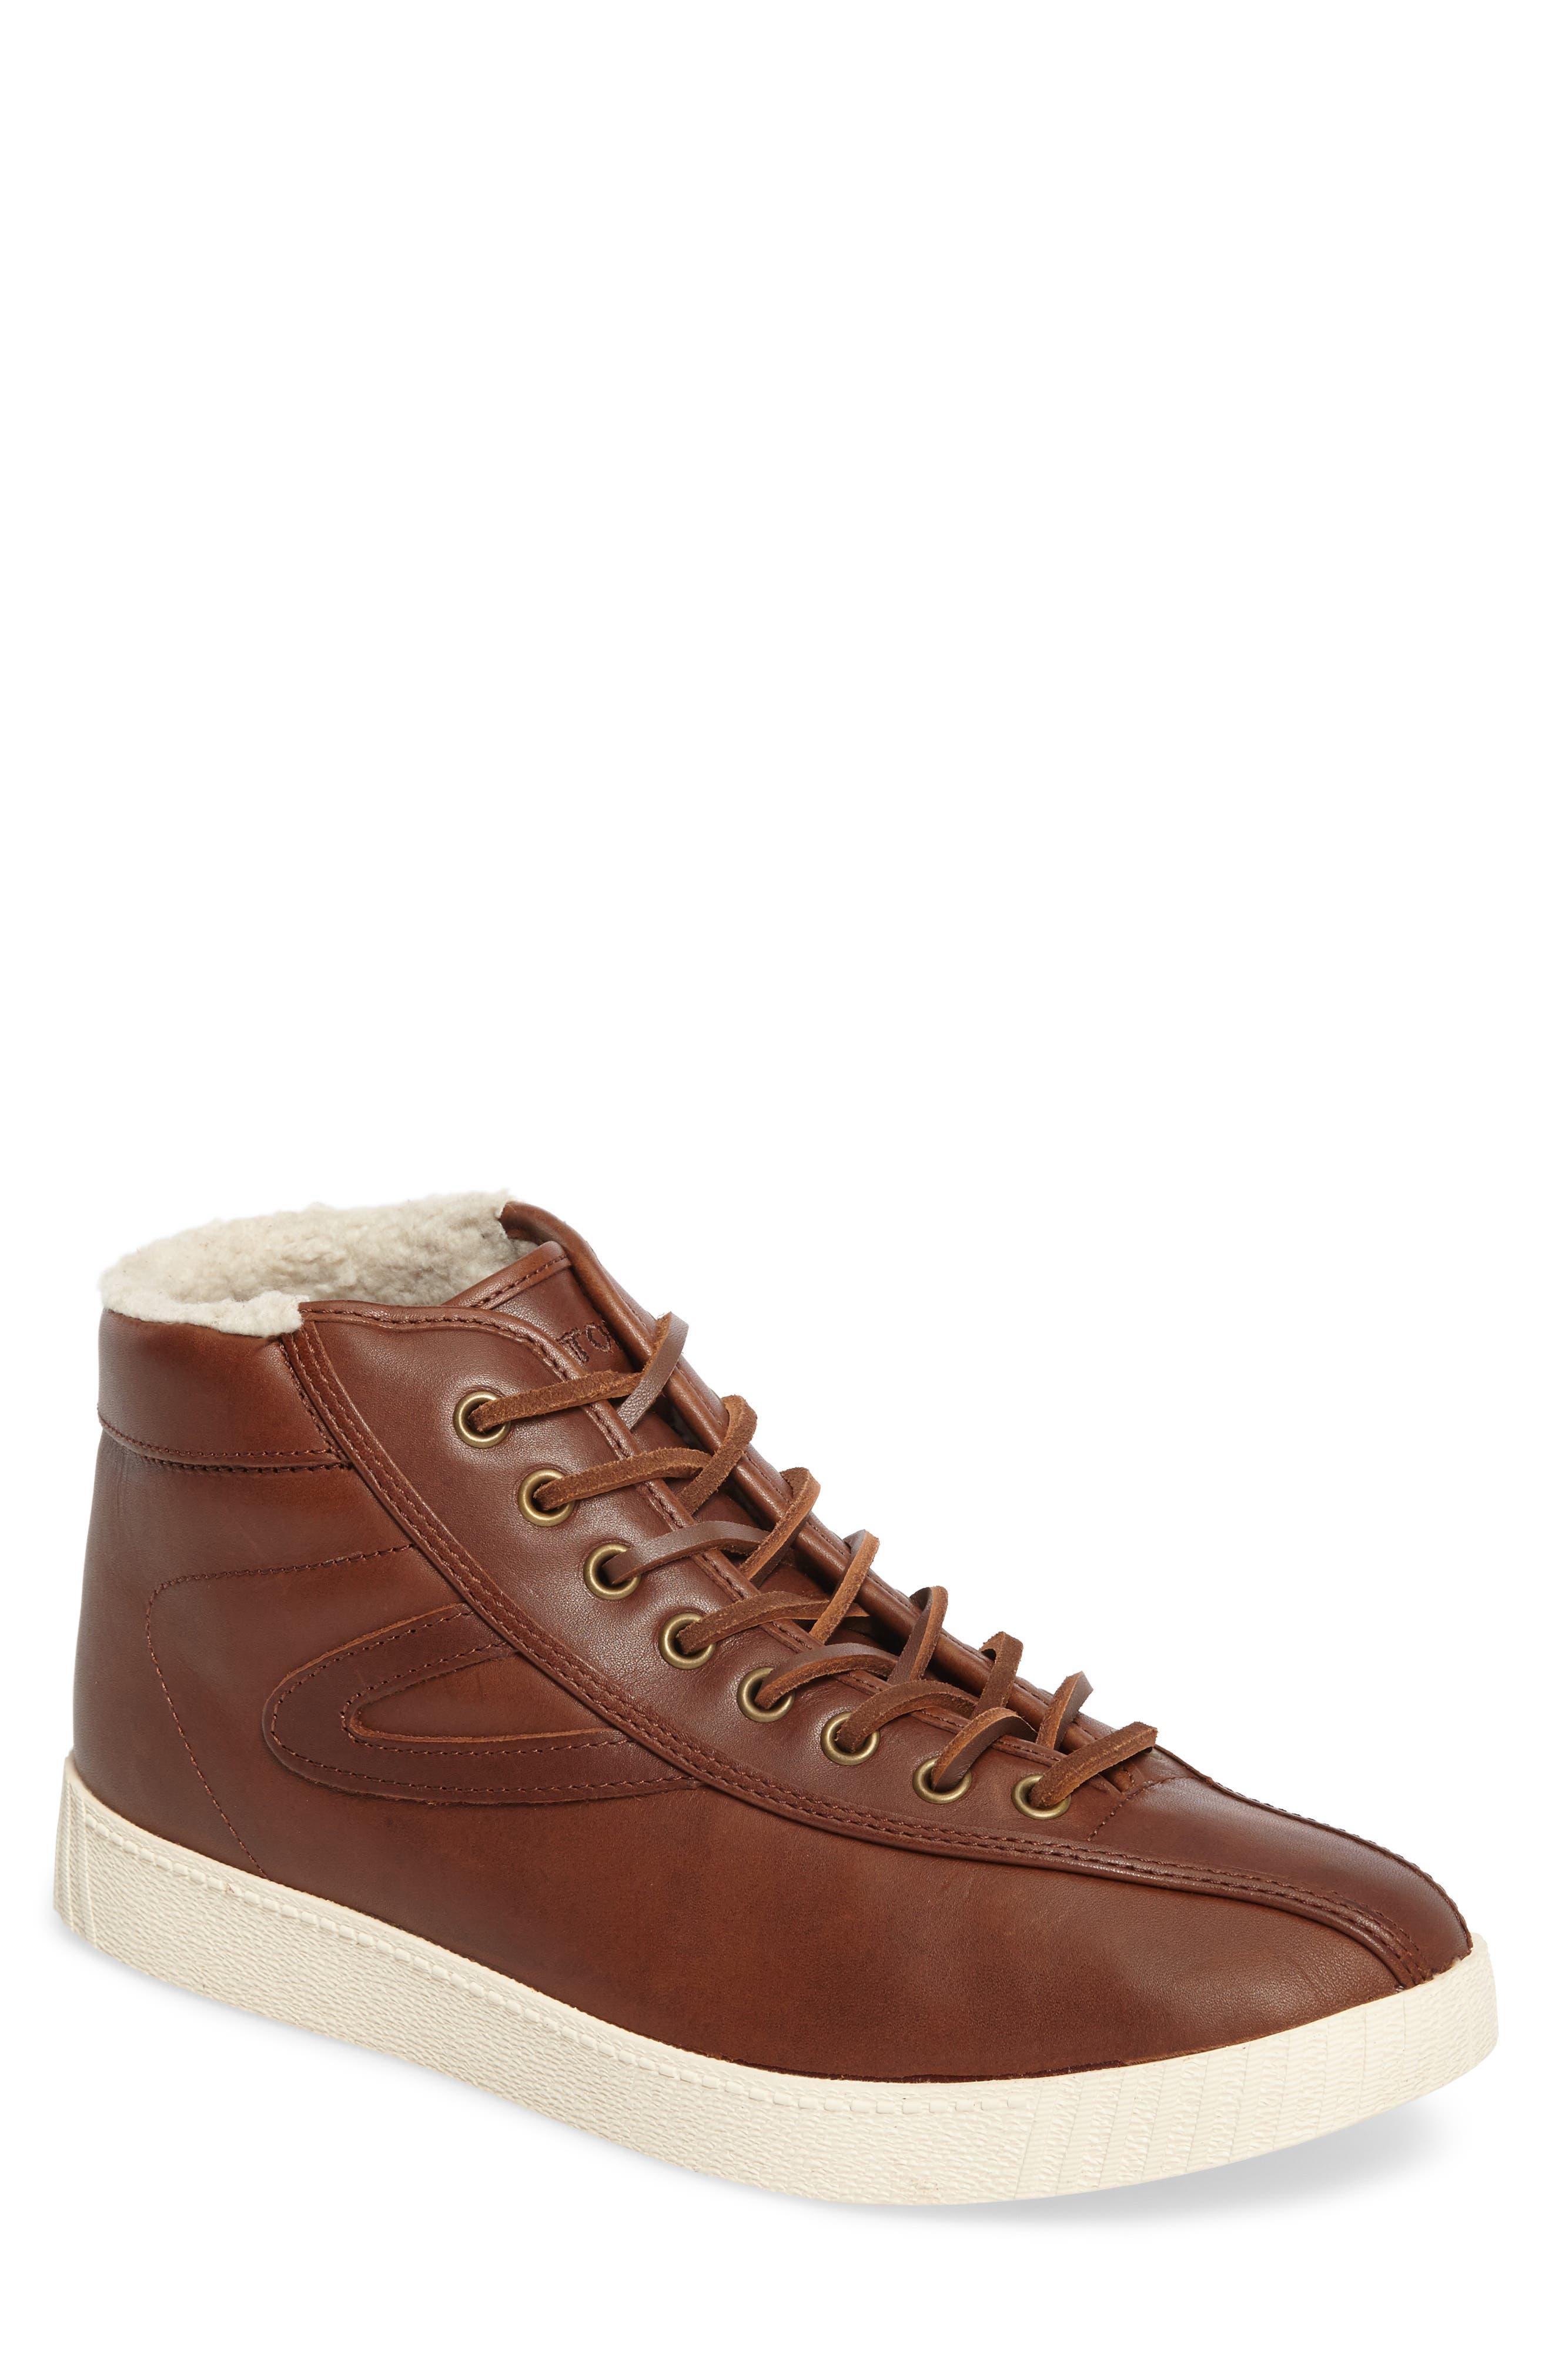 Alternate Image 1 Selected - Tretorn Nylite Hi 2 Sneaker (Men)